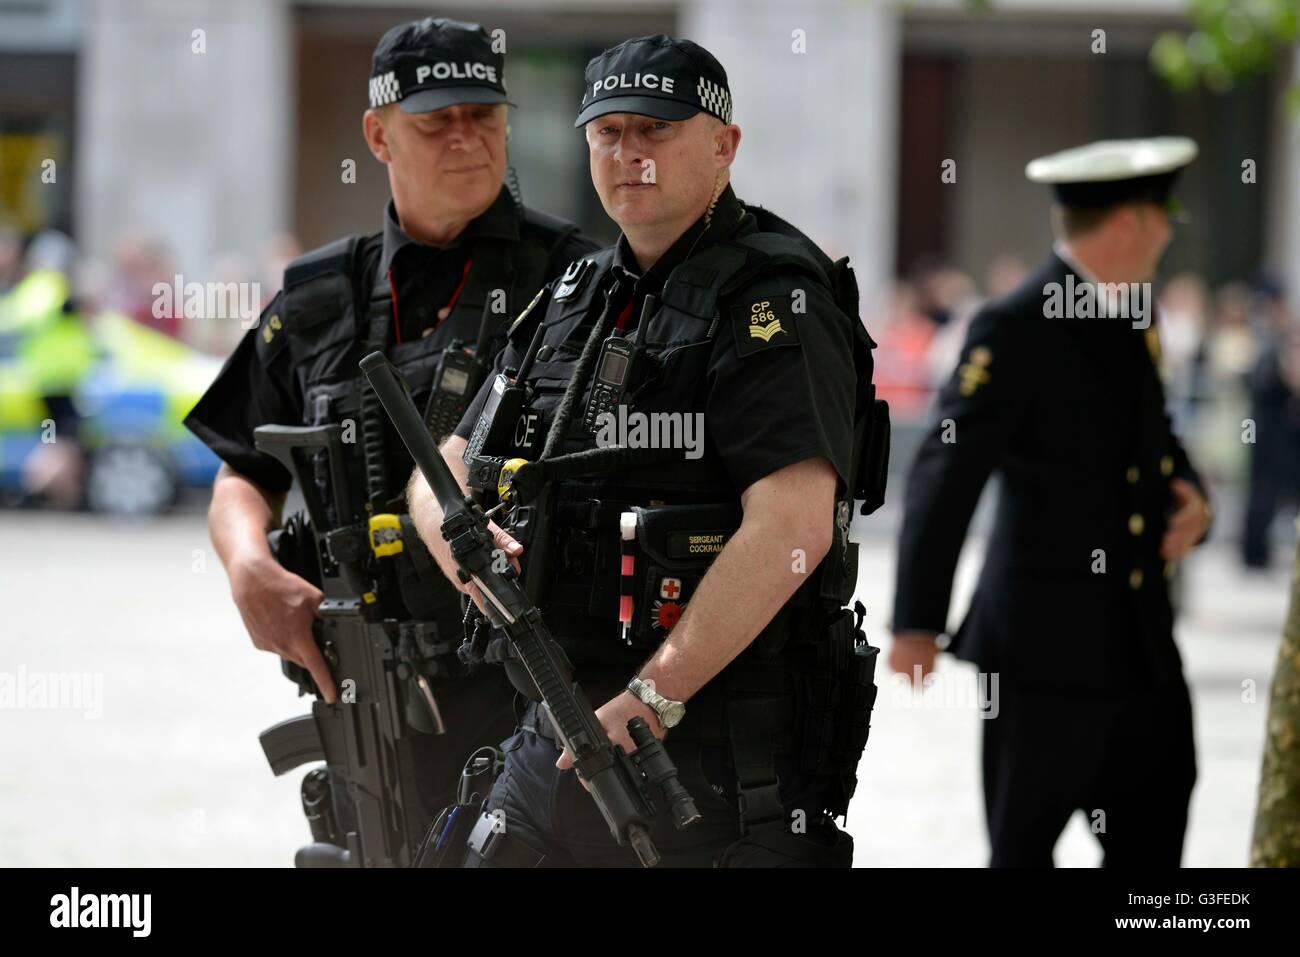 Armed police, London, Britain, UK - Stock Image